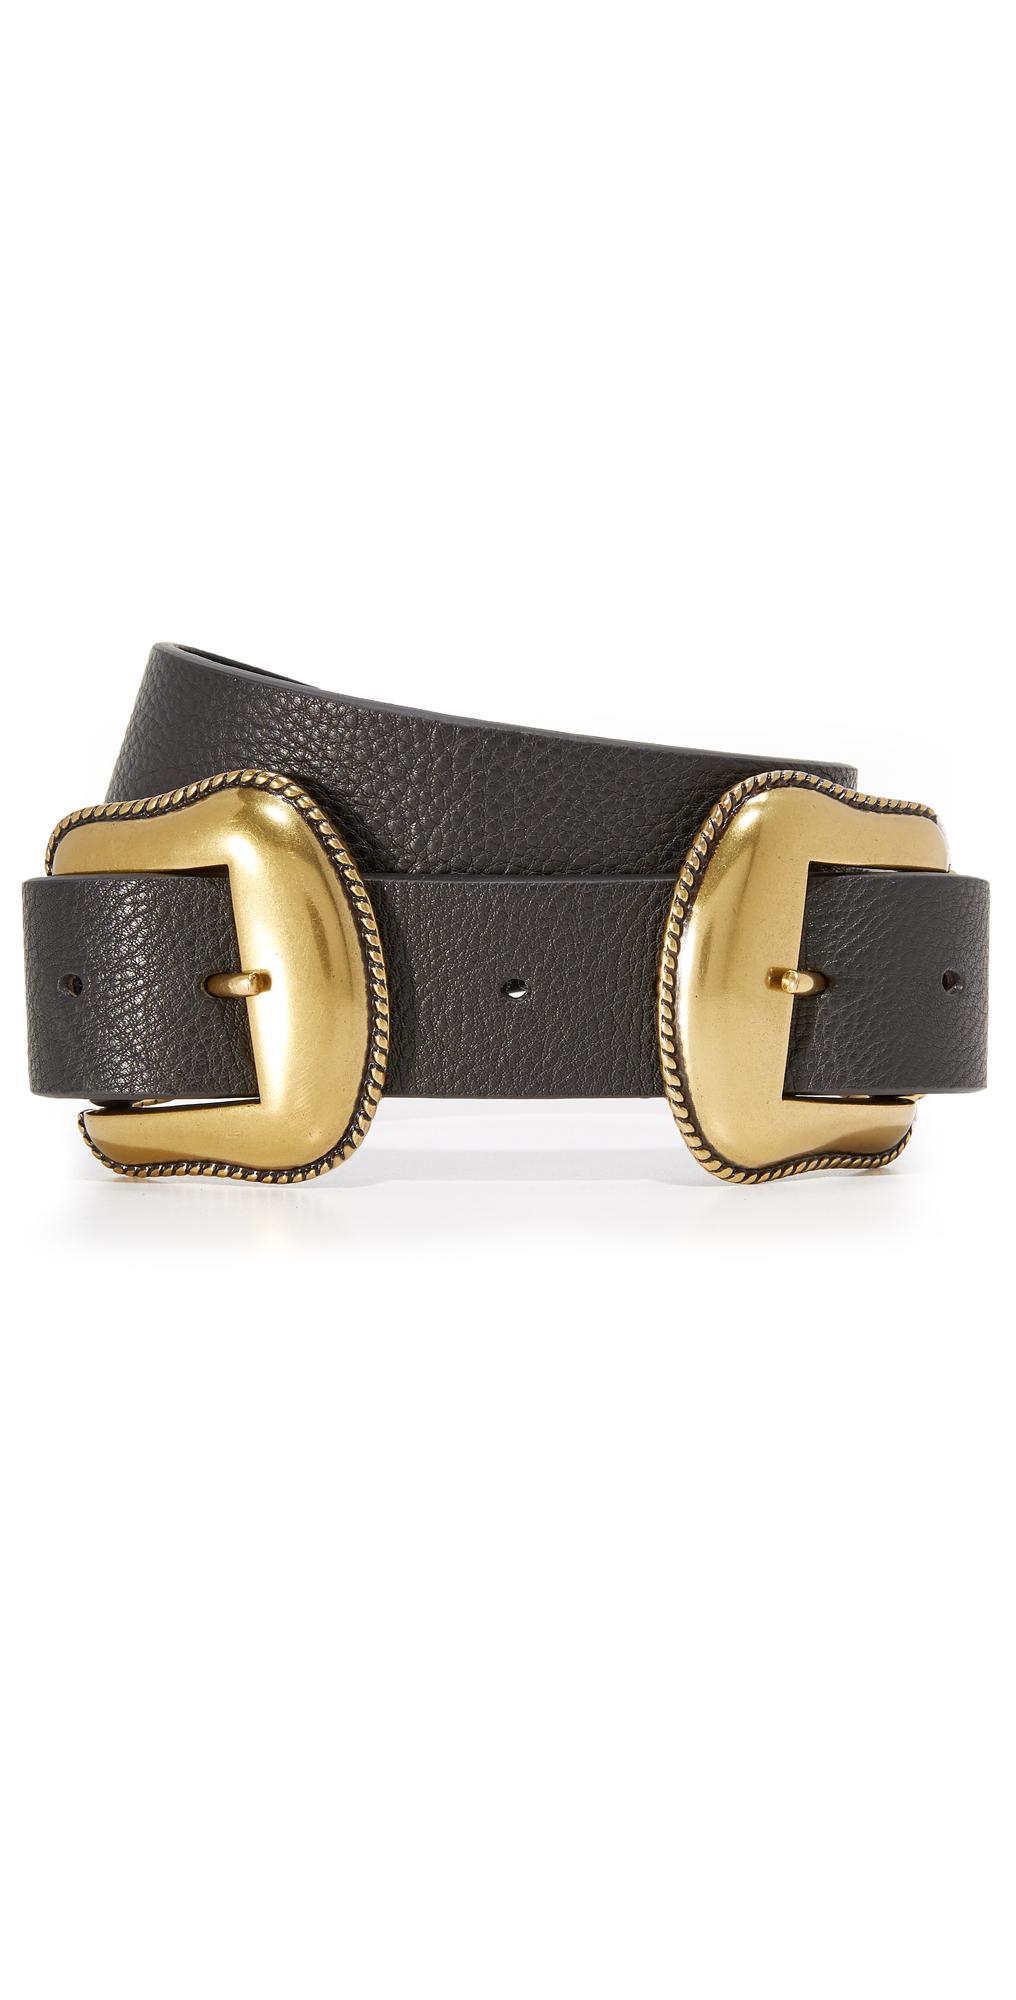 Rouge Belt B-Low The Belt